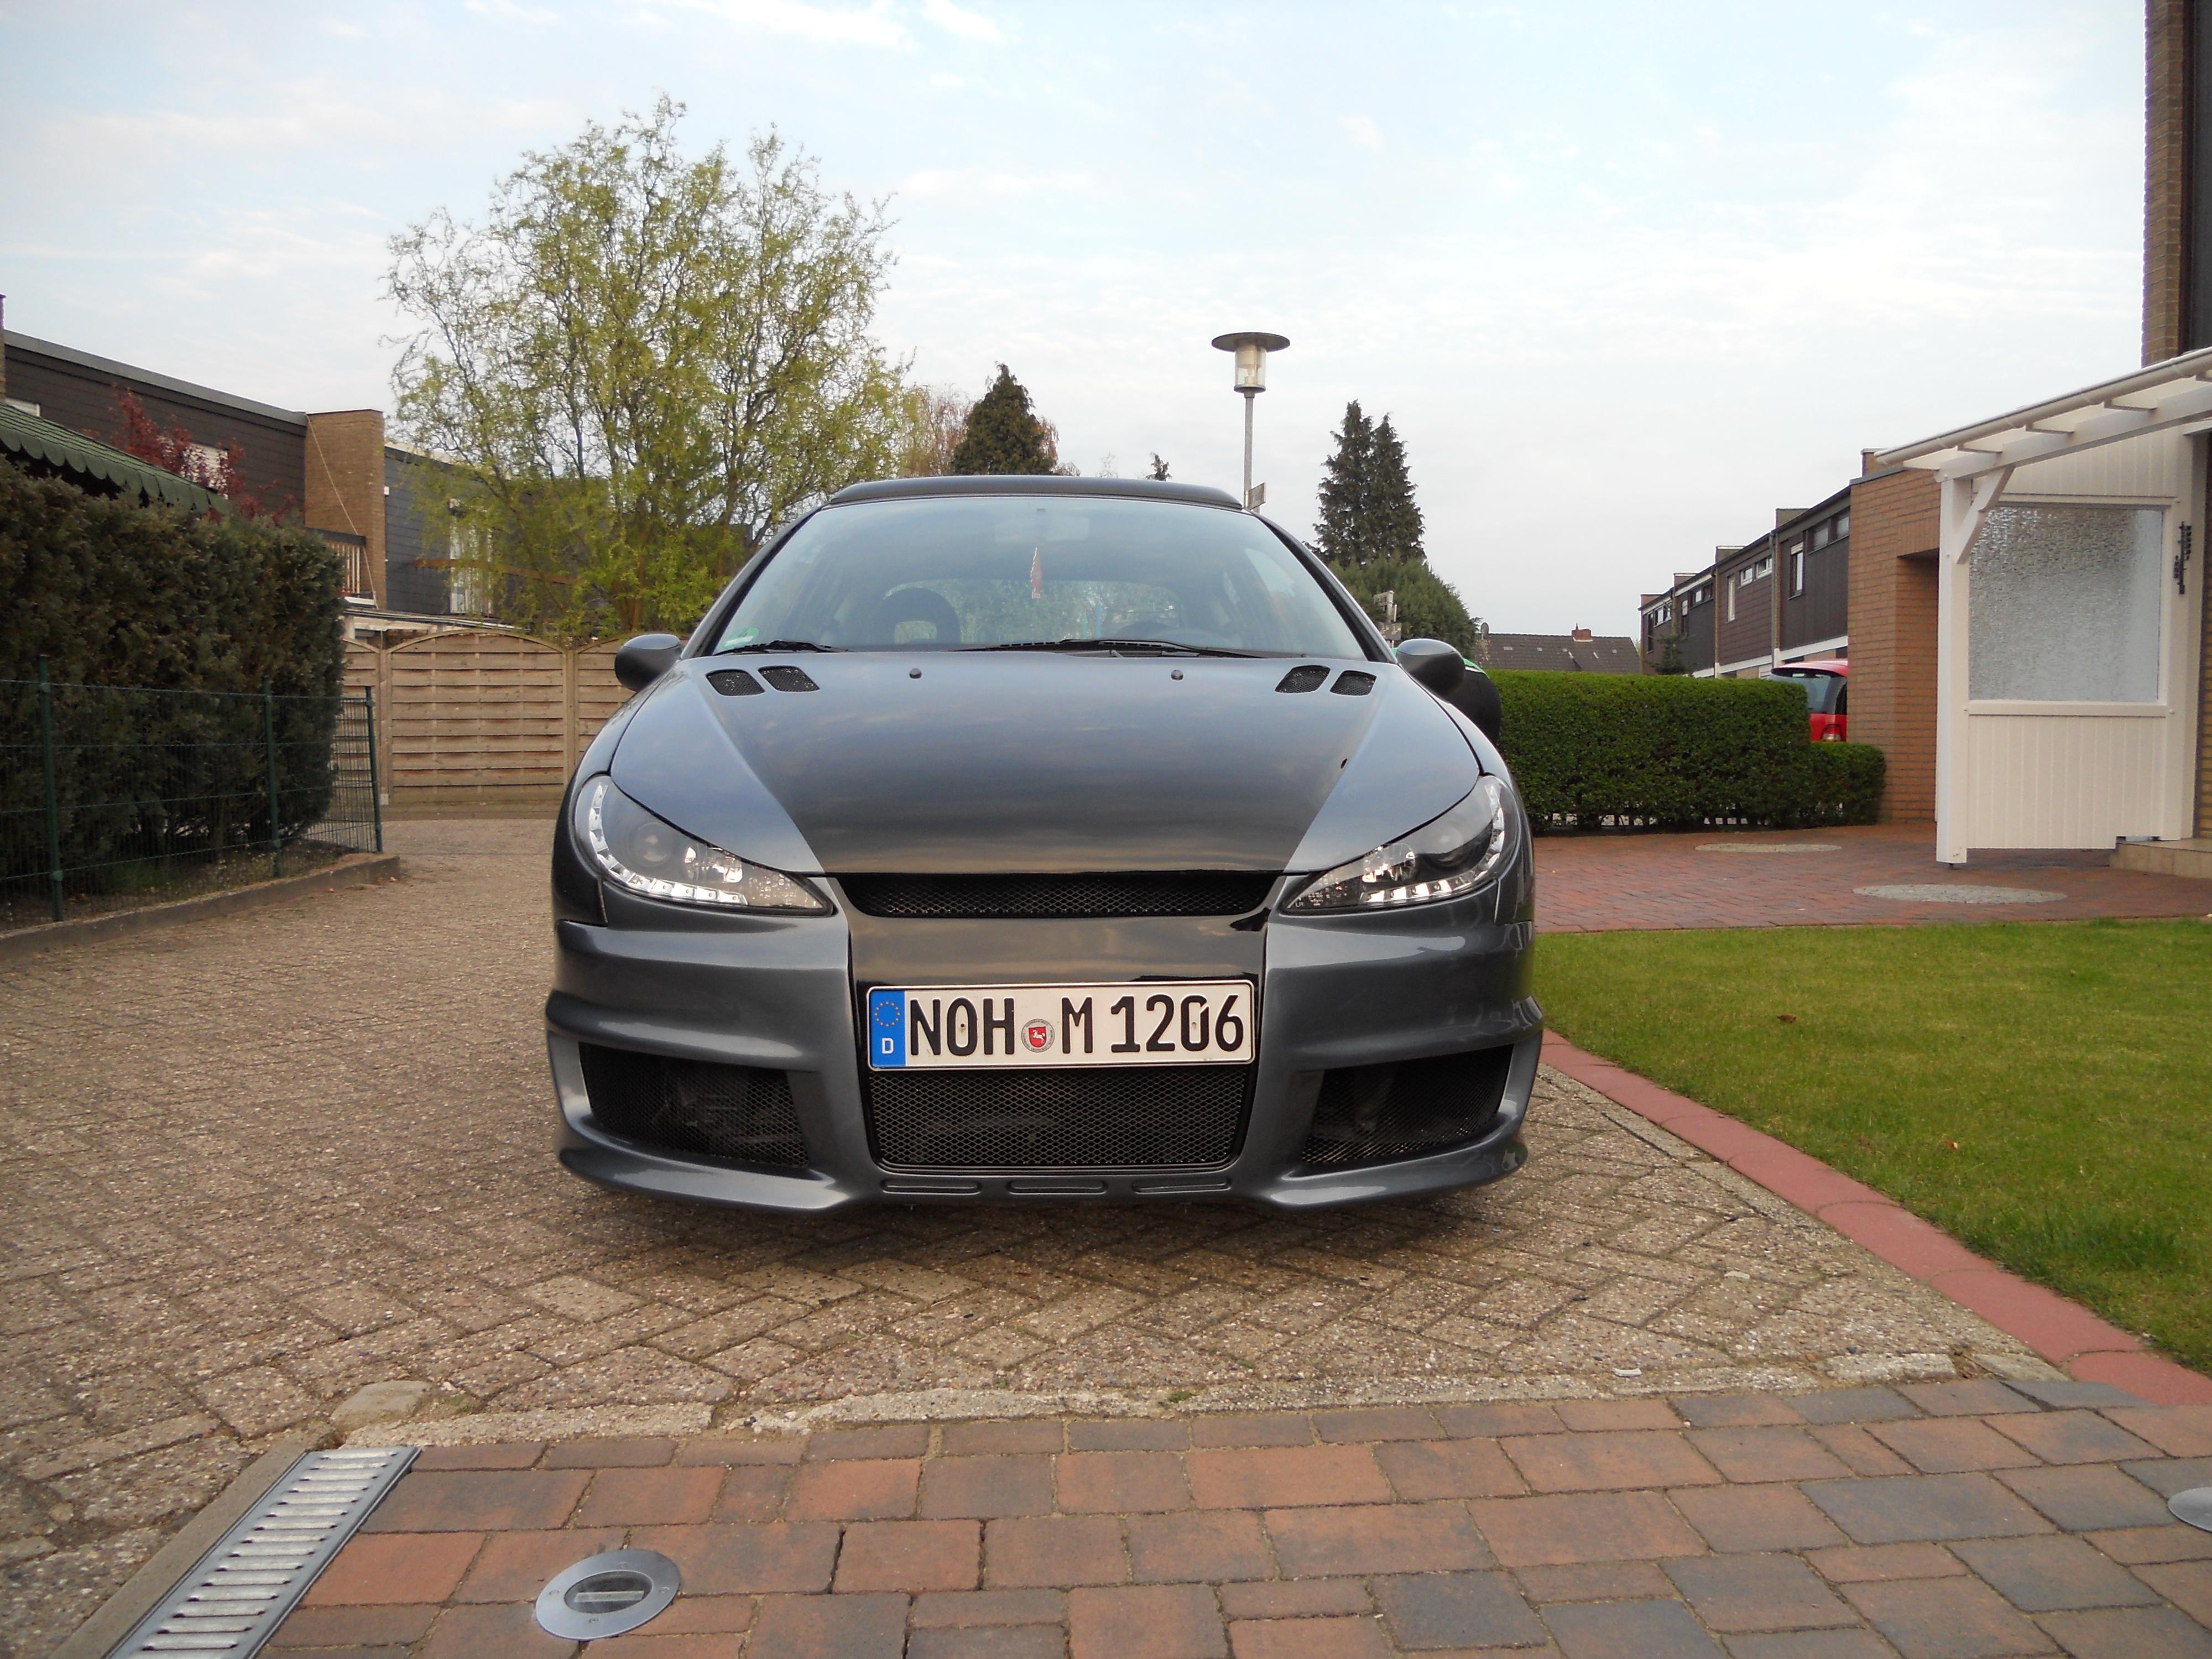 206 1.4 Hdi Tuning Auto Peugeot 206 1.4 Hdi